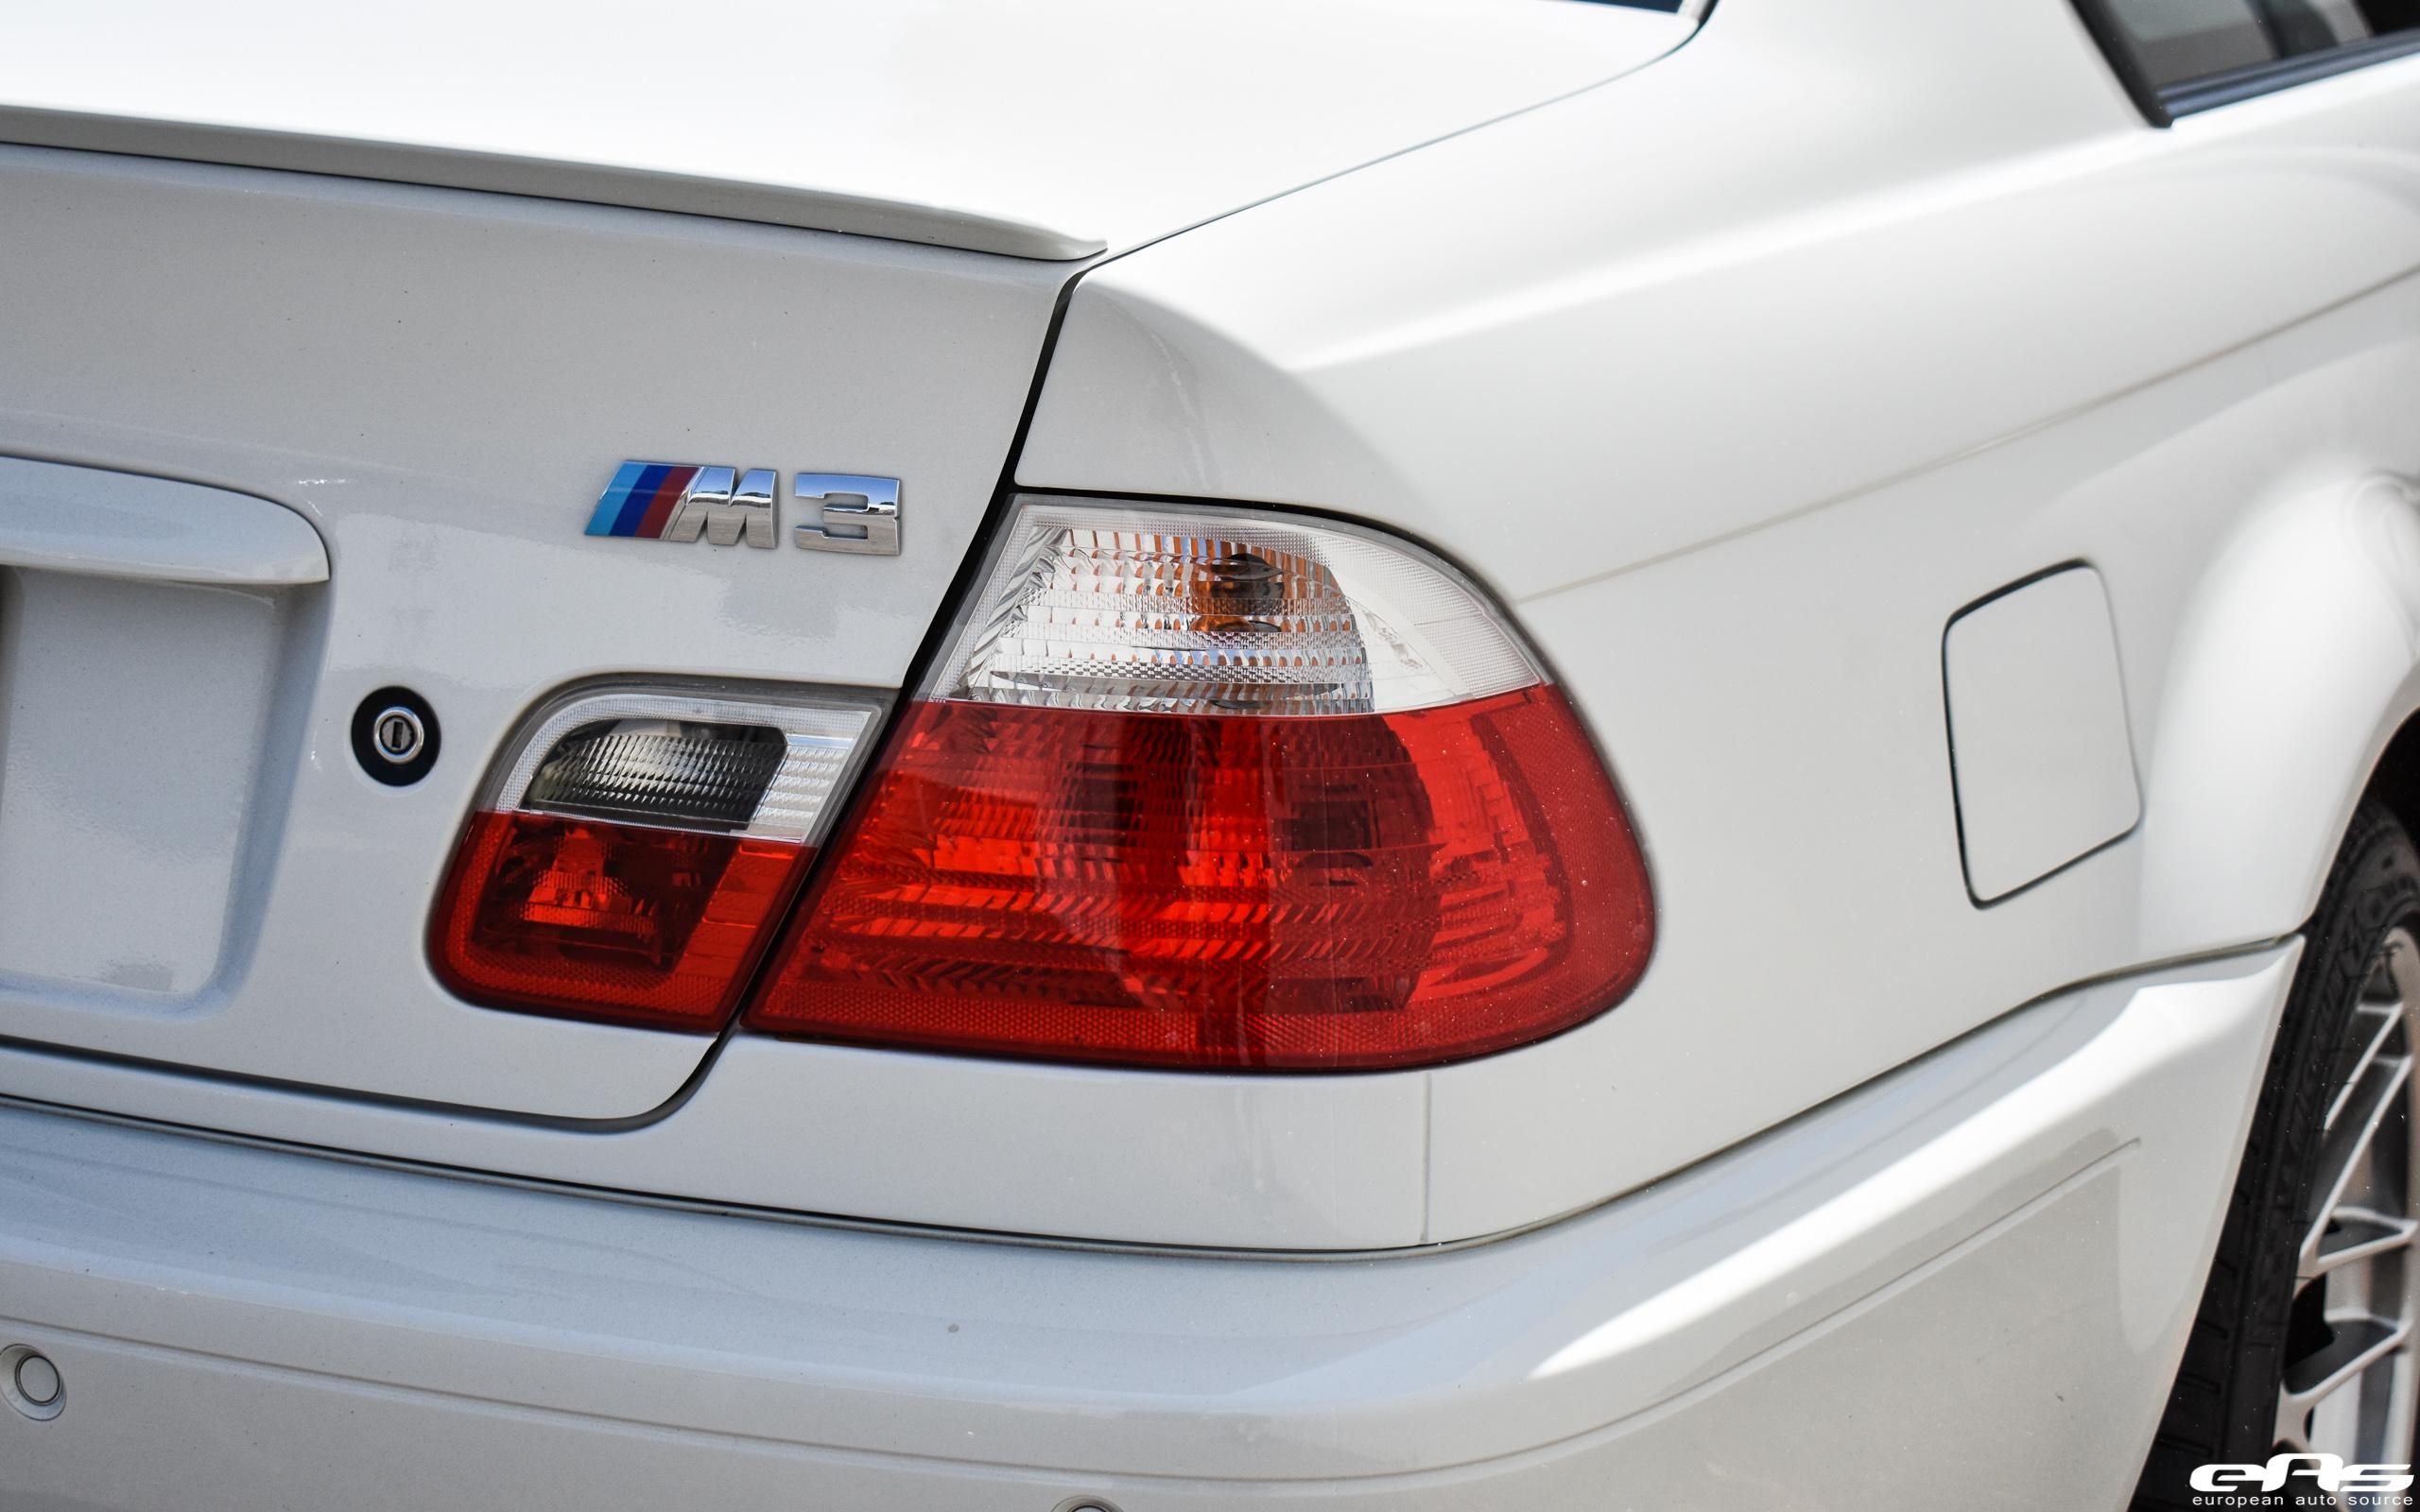 Alpine White BMW E46 M3 Build By European Auto Source Image 9